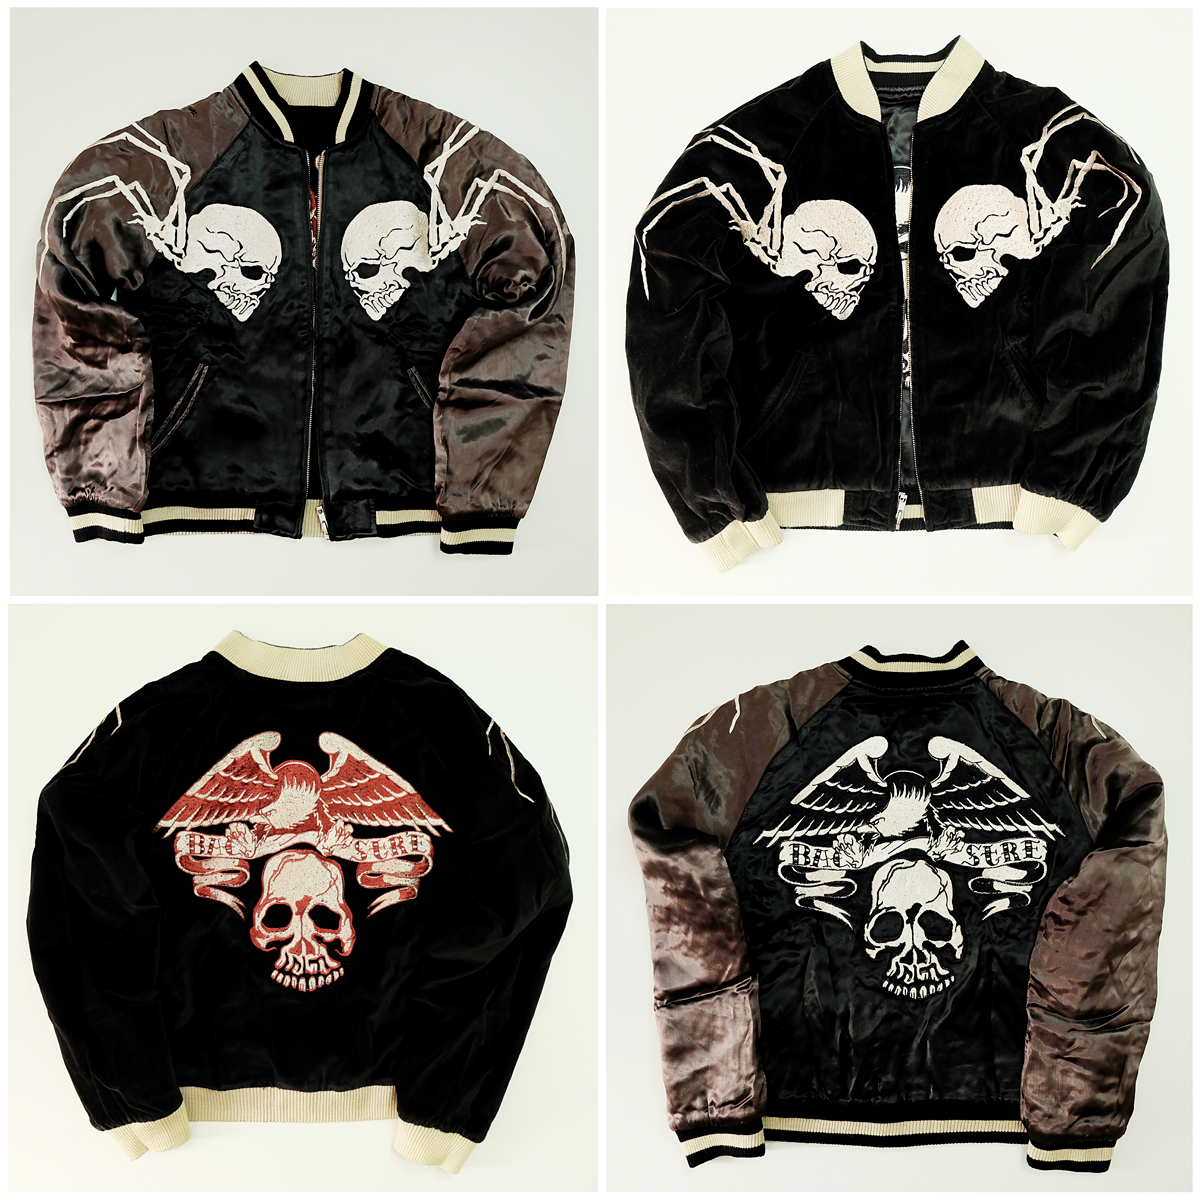 Vintage Sukajan Skull Embroidery Jacket Embroidery Souvenirs Hoodie Punk Rock Jacket f3g61